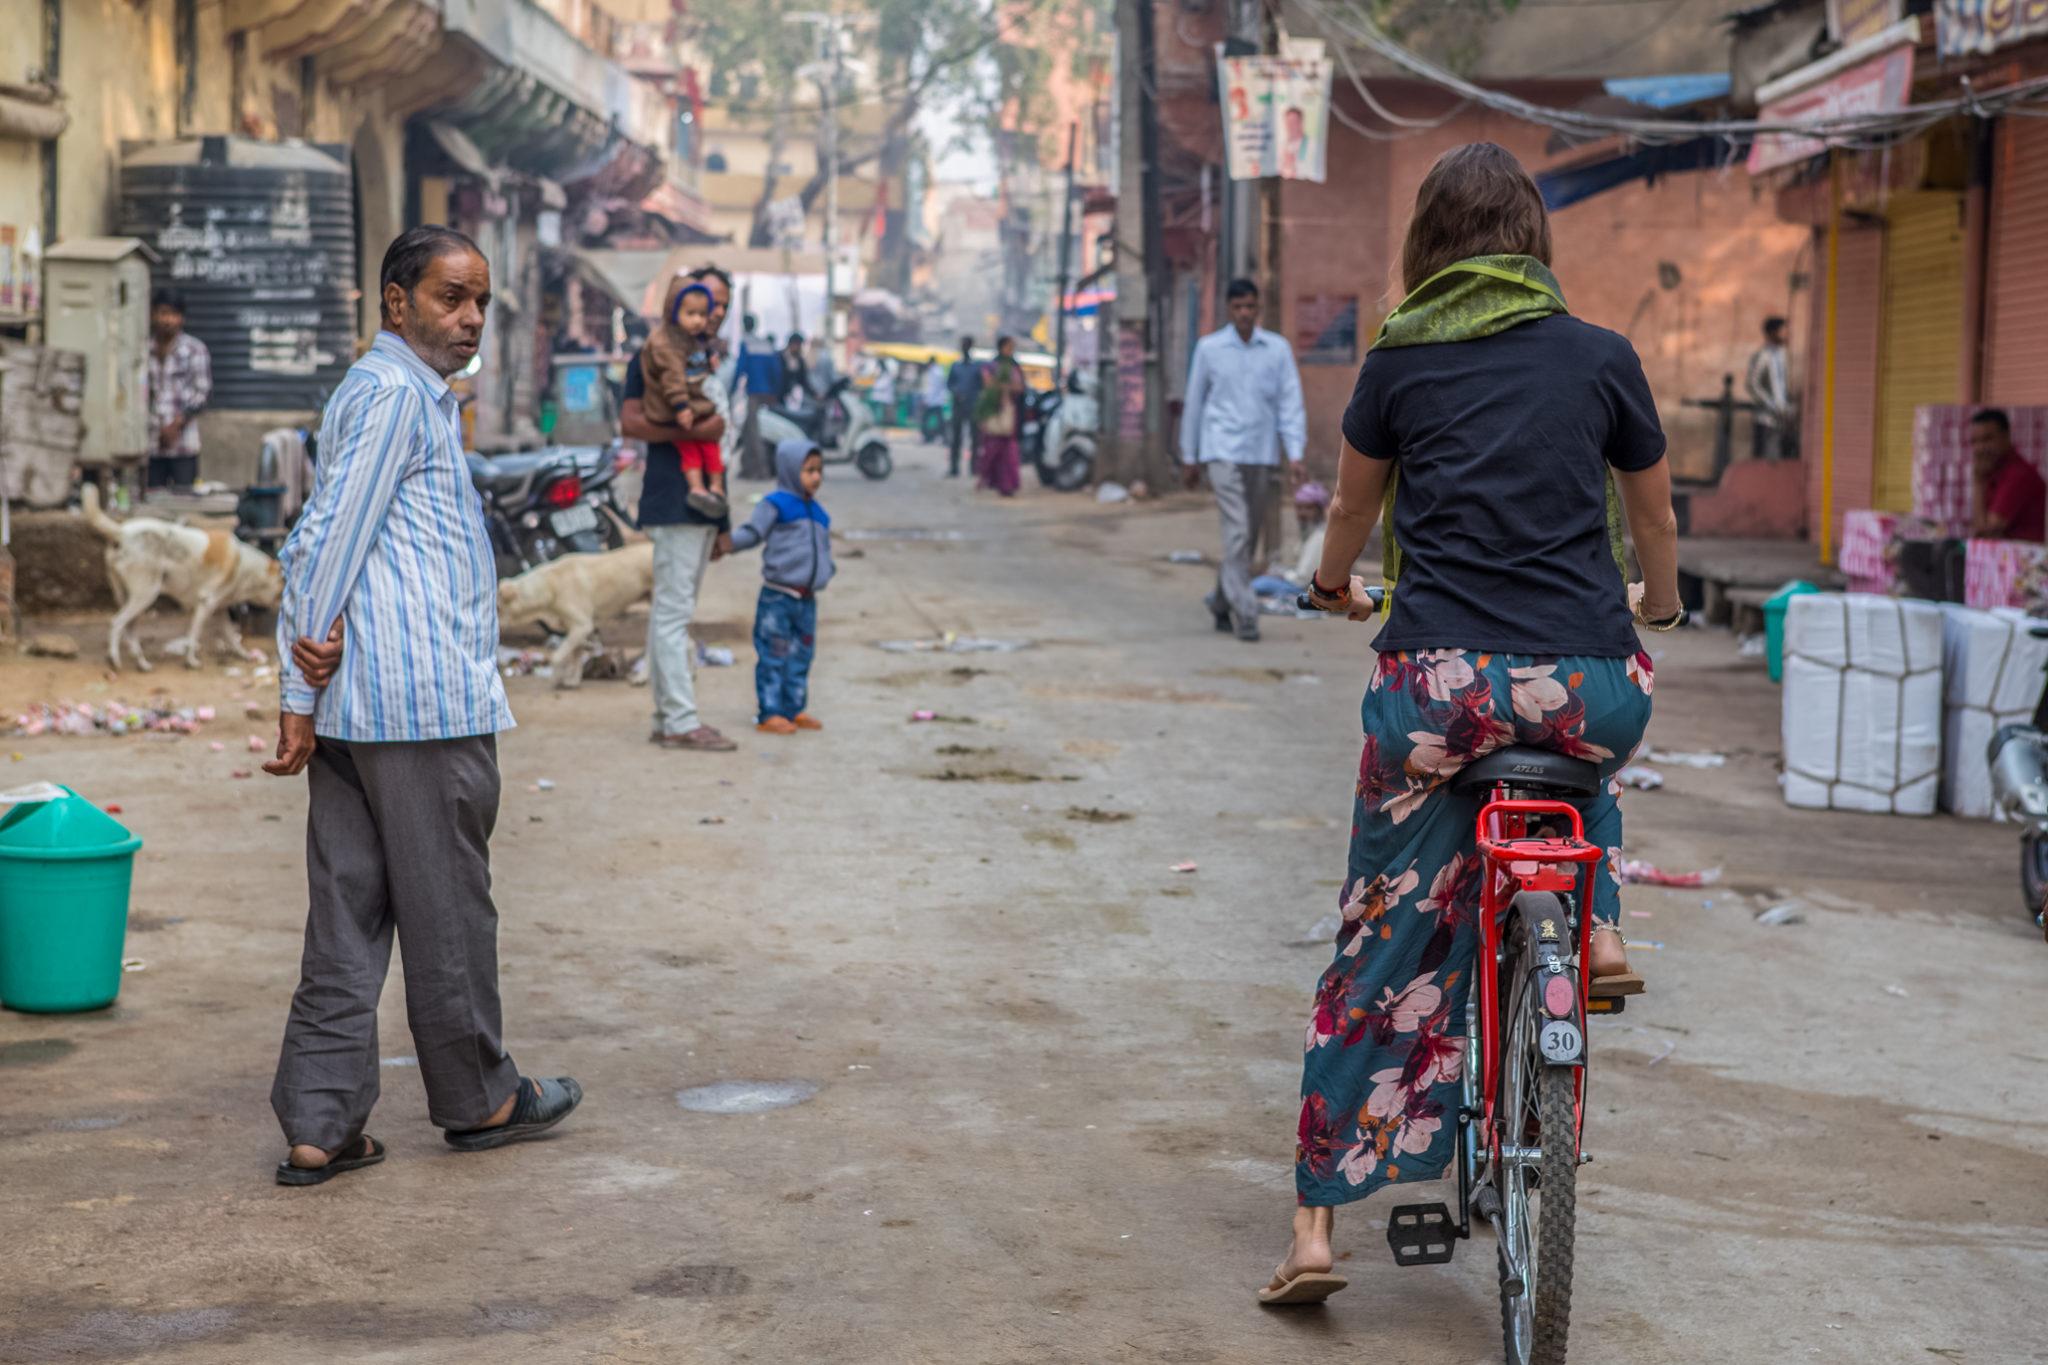 visite-jaipur-vélo-cyclin-inde